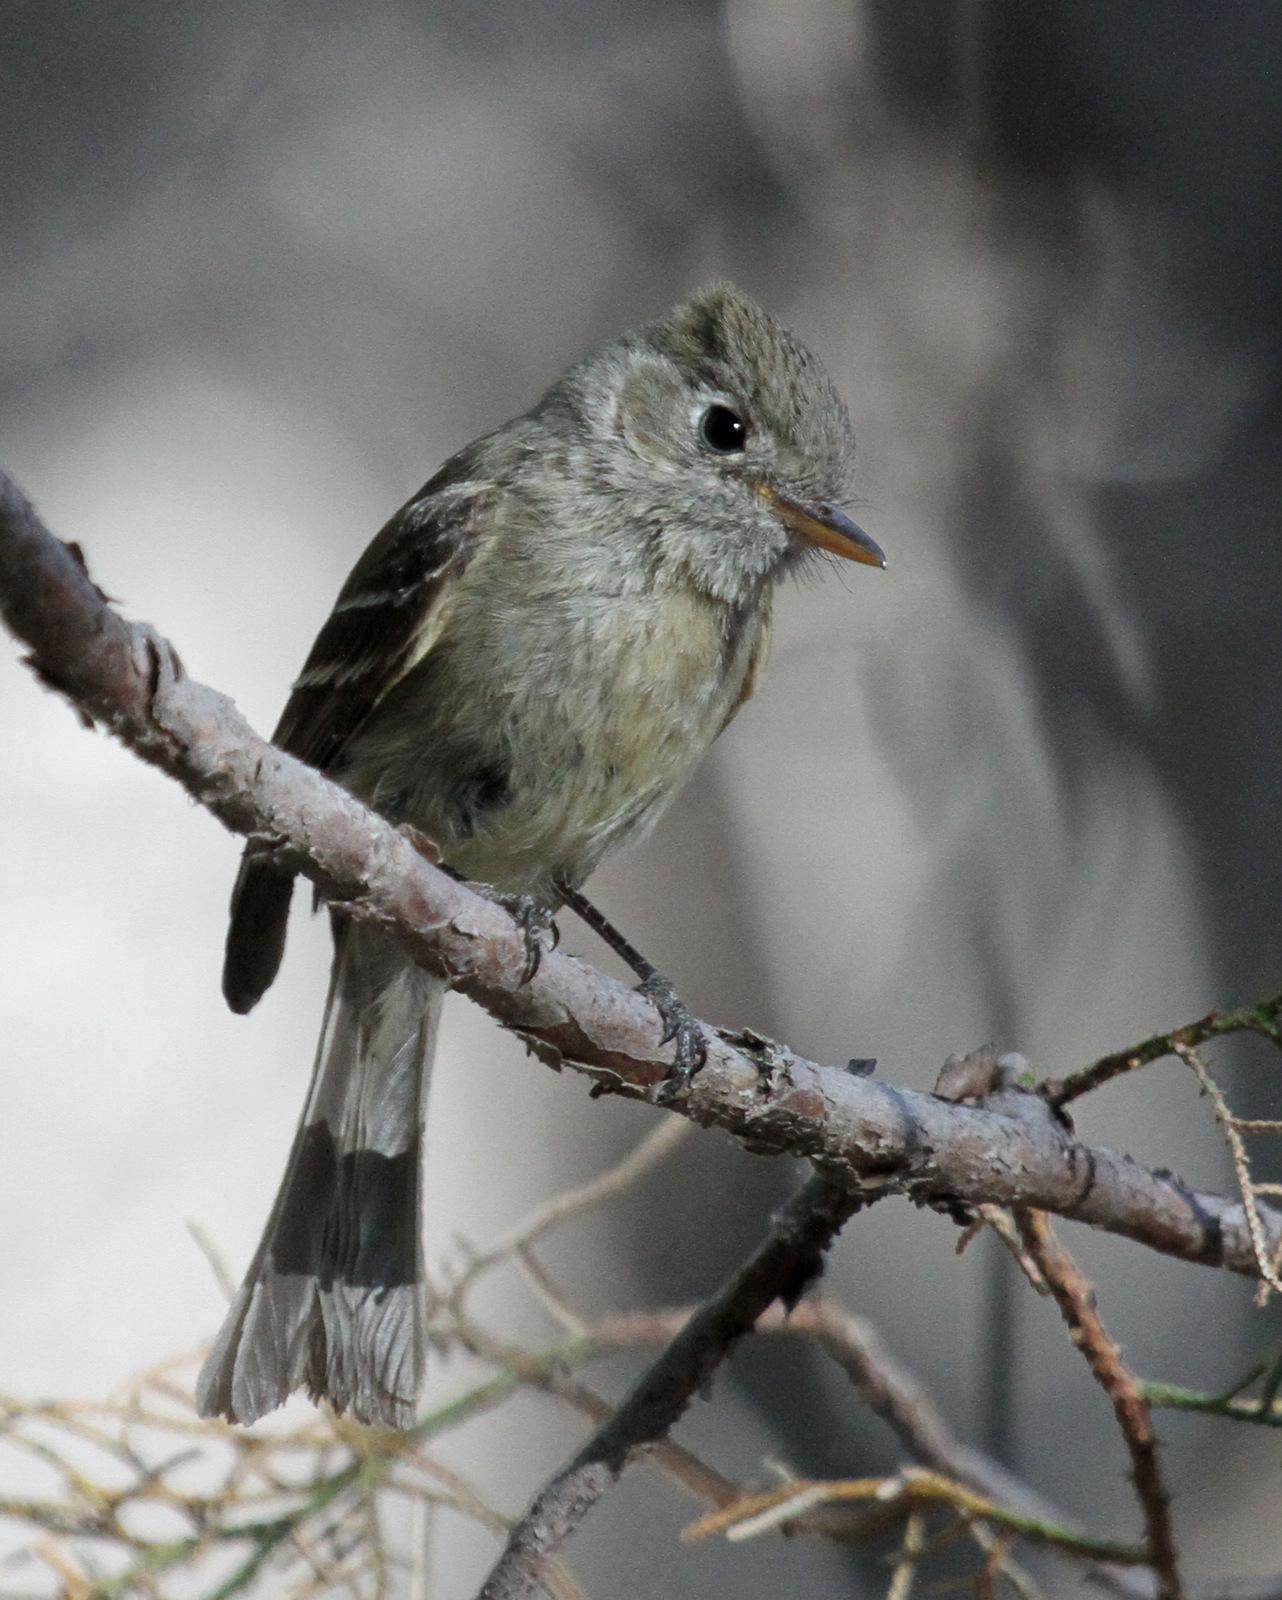 Pine Flycatcher Photo by Matthew Grube